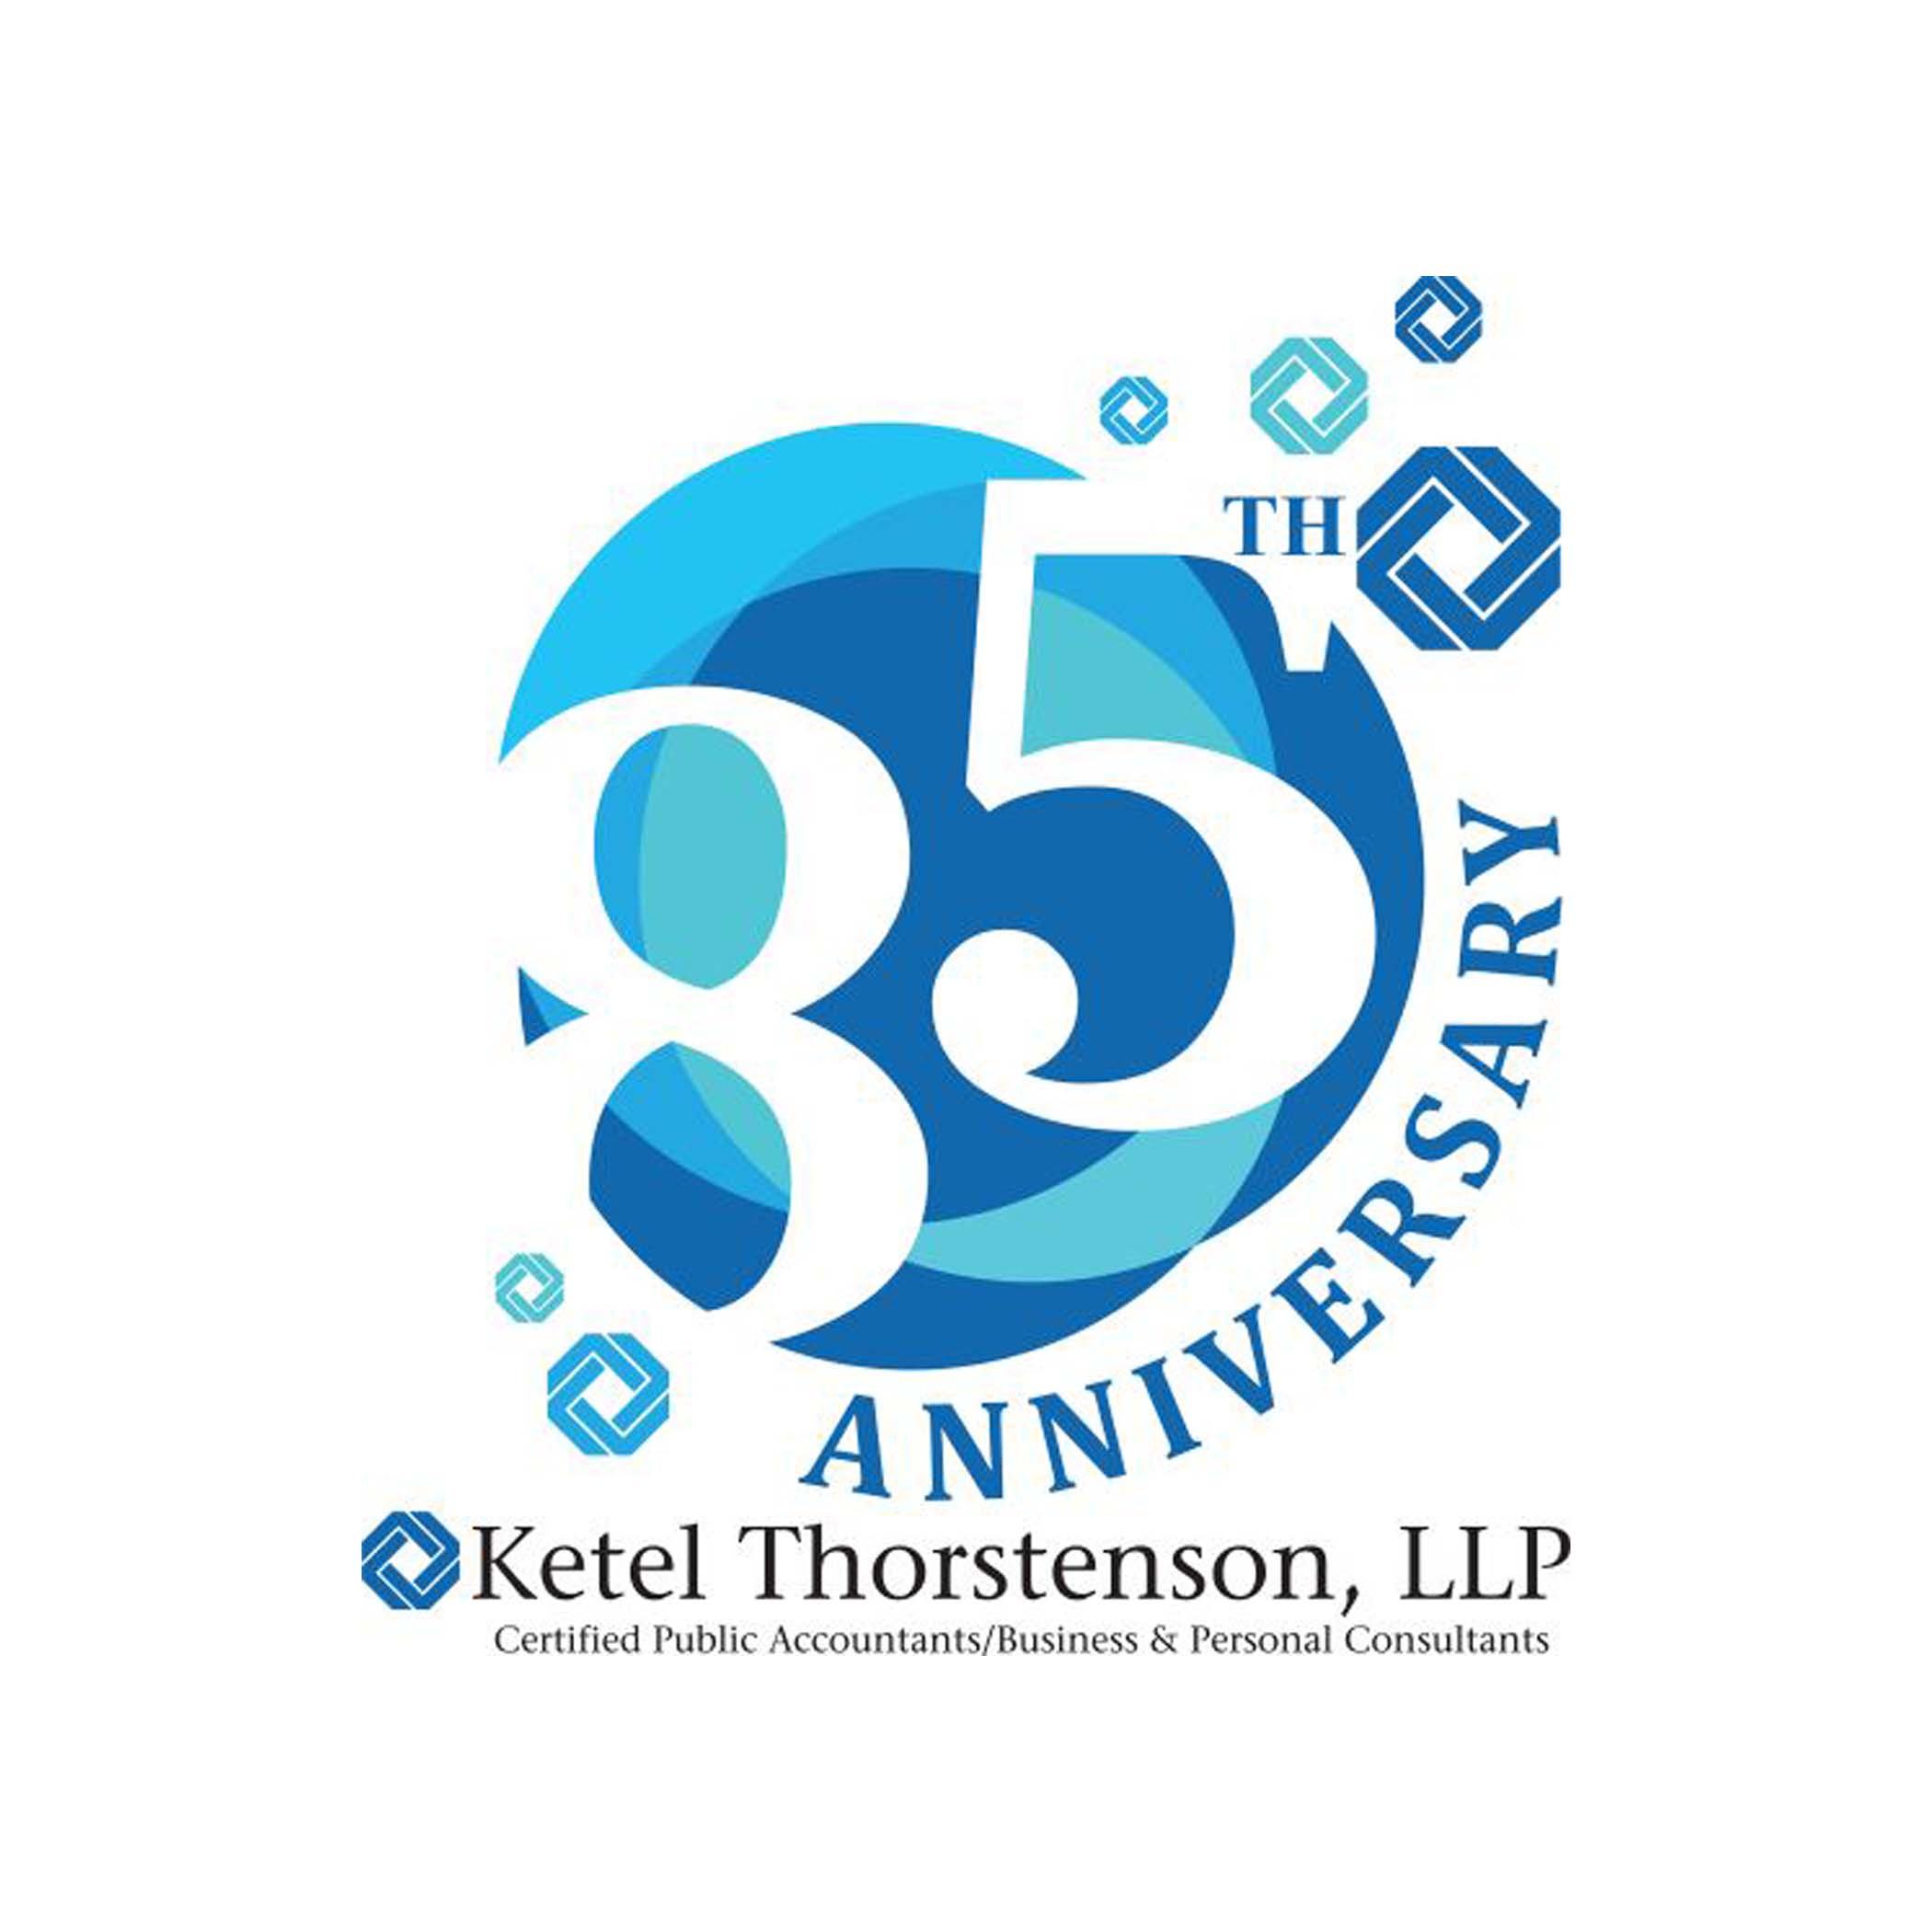 Ketel Thorstenson, LLP